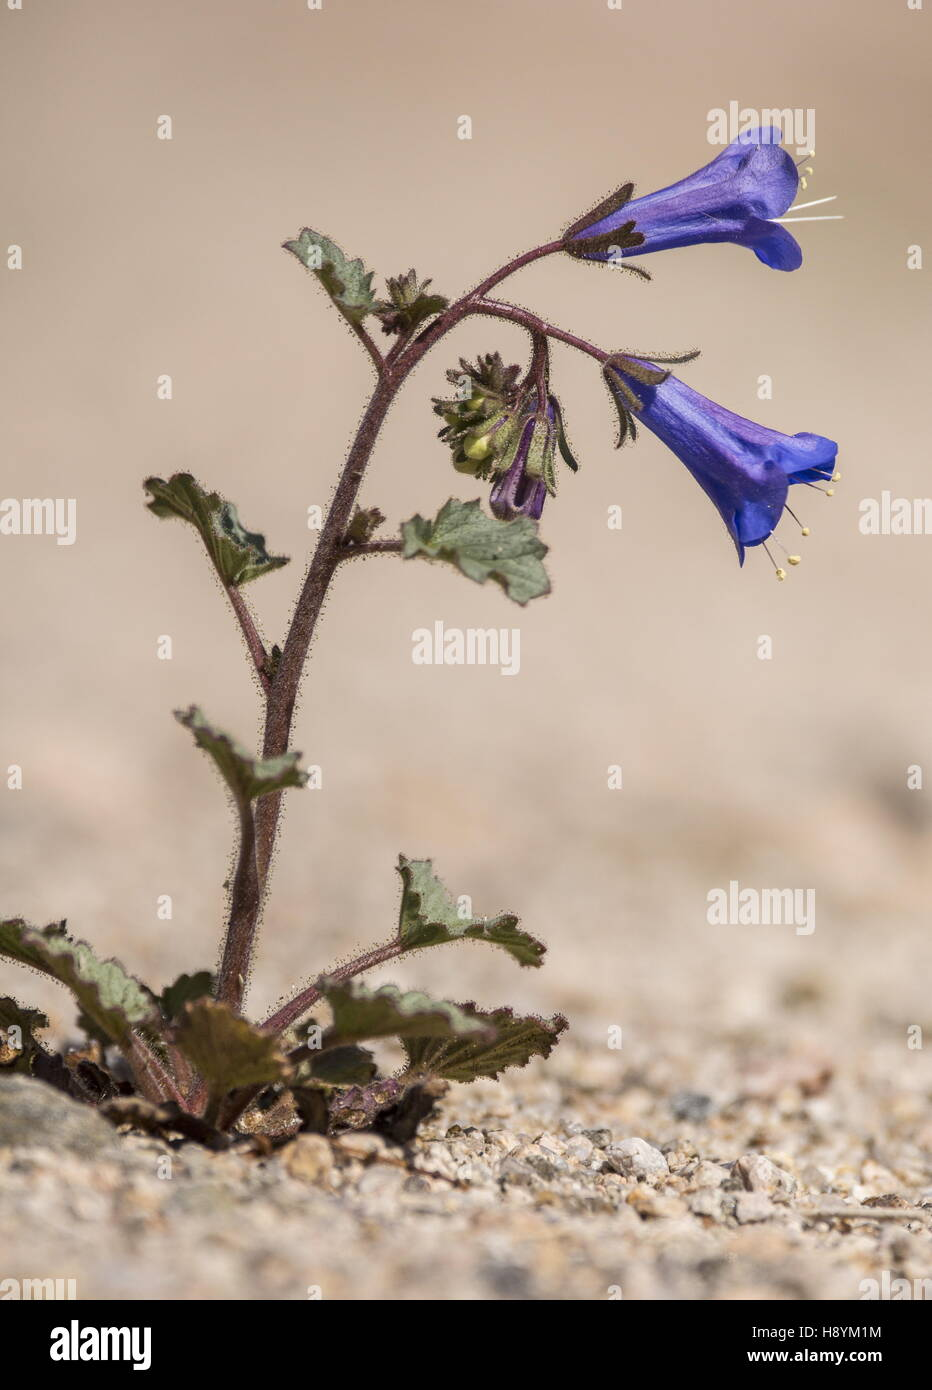 Desert Canterbury Bells, Phacelia campanularia, in flower on gravelly desert wash, Joshua Tree National Park, California. - Stock Image